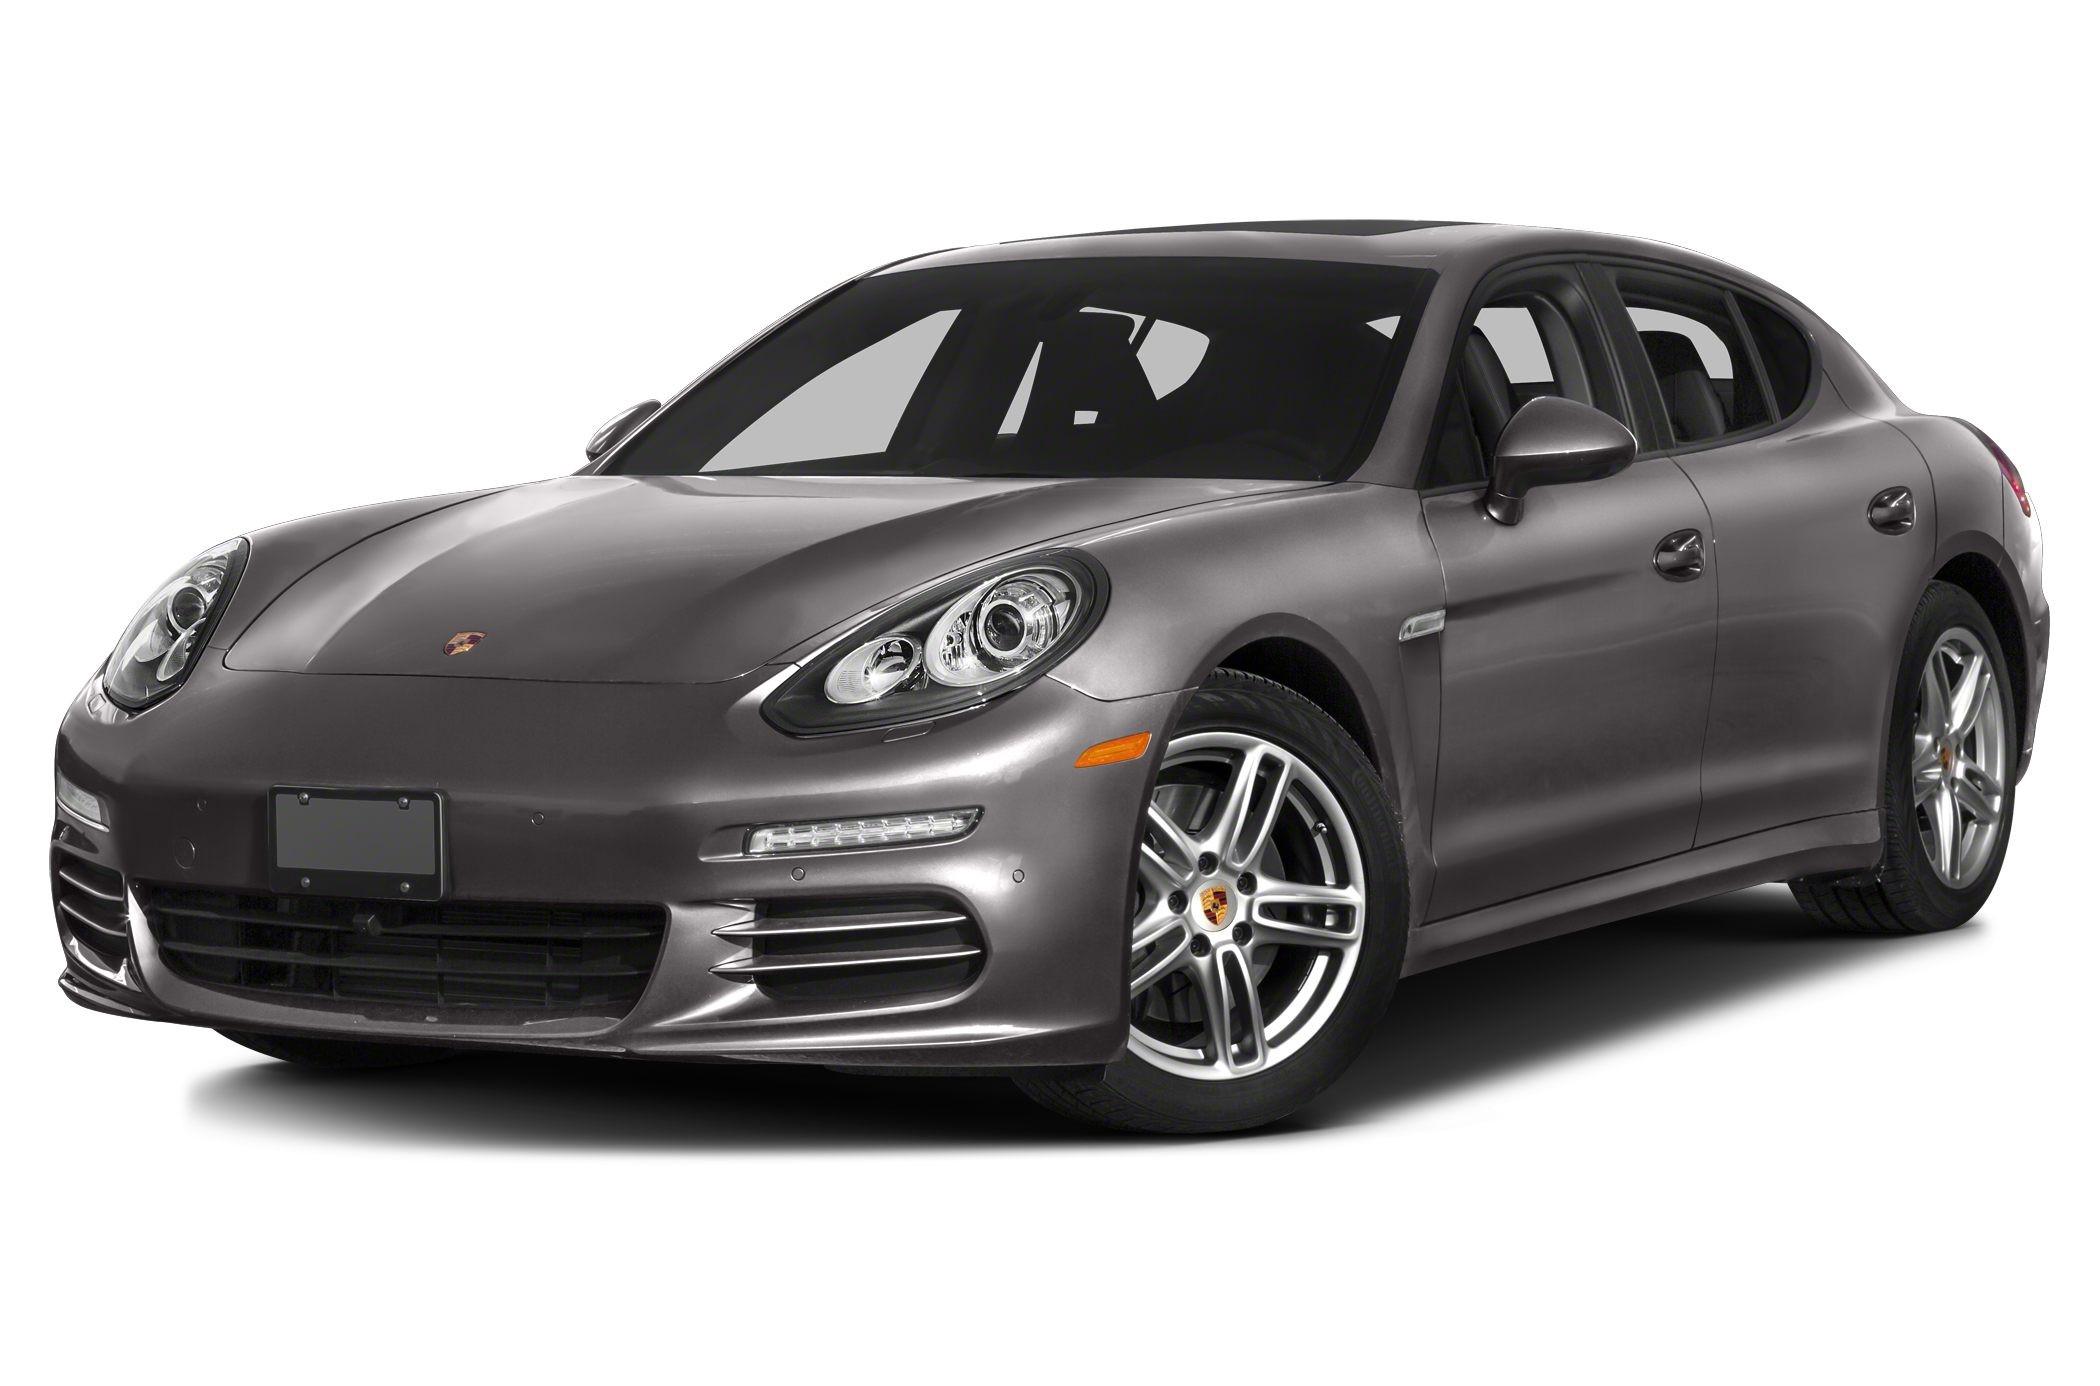 Porsche Panamera Background Wallpapers